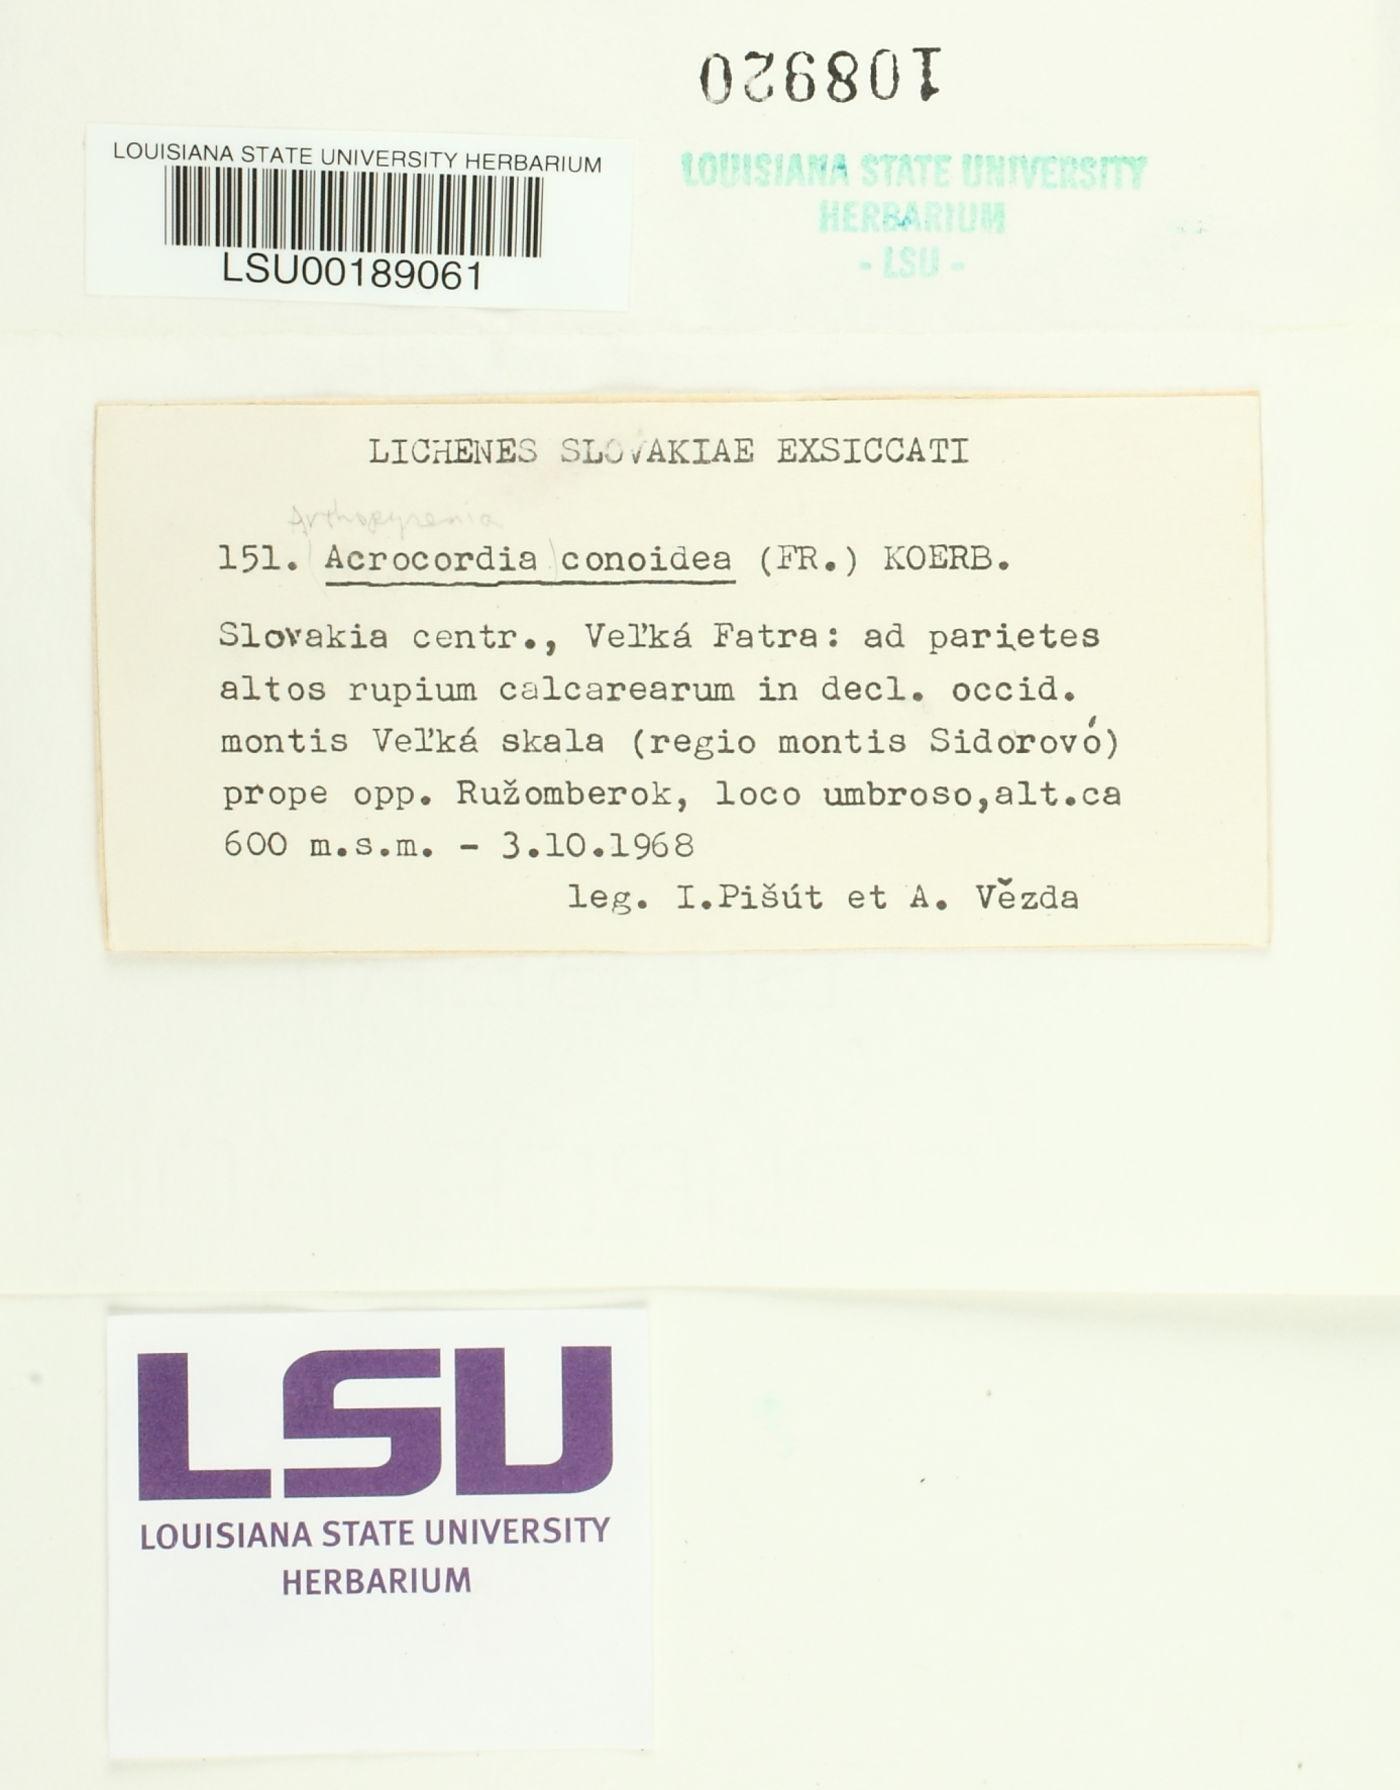 Acrocordia conoidea image